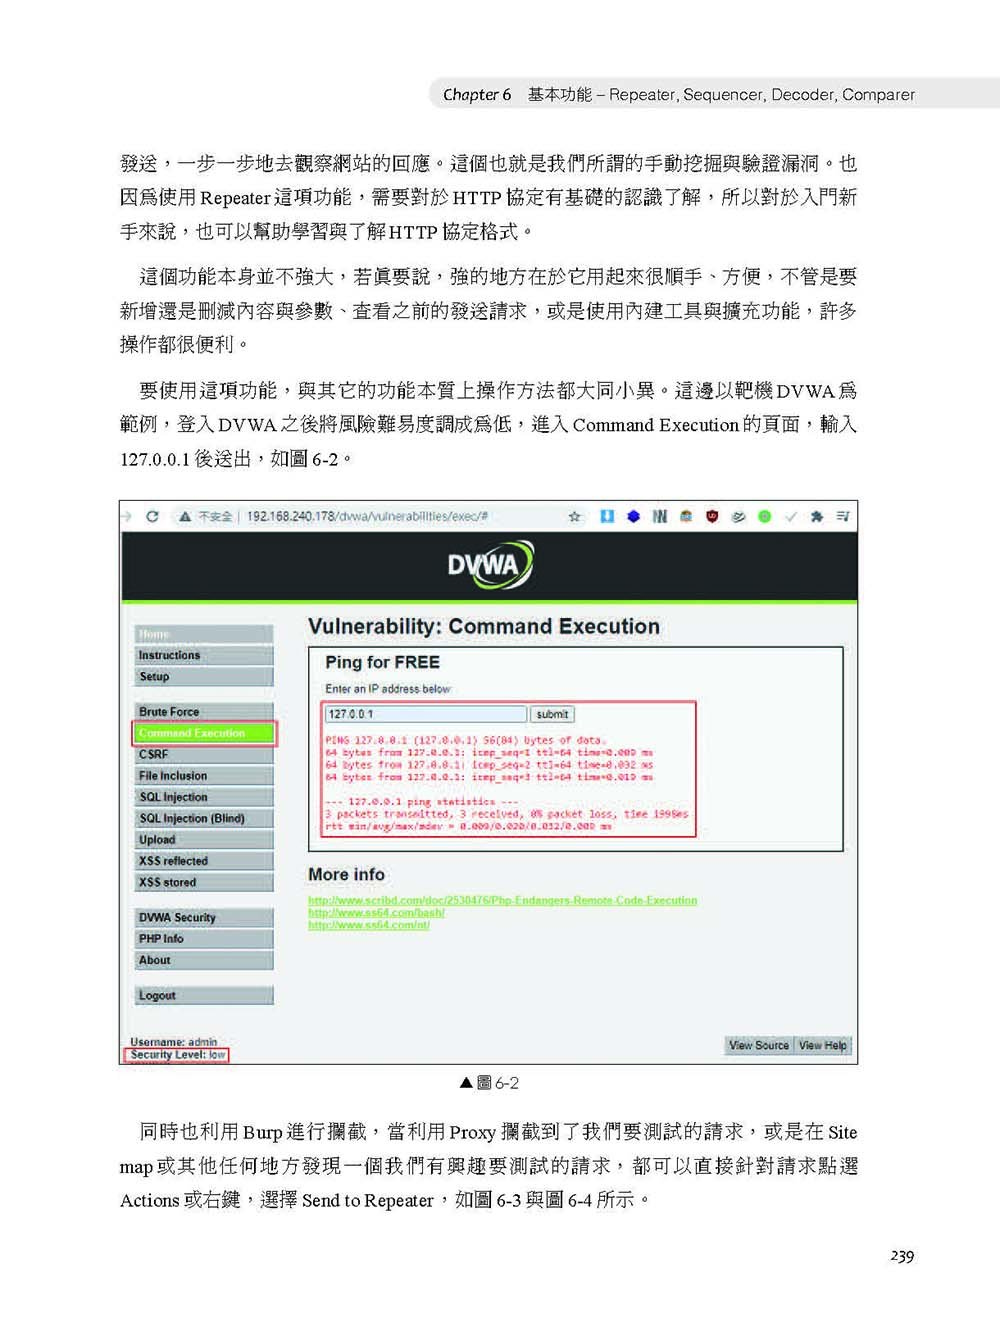 WebSecurity 網站滲透測試:Burp Suite 完全學習指南 (iT邦幫忙鐵人賽系列書)-preview-9